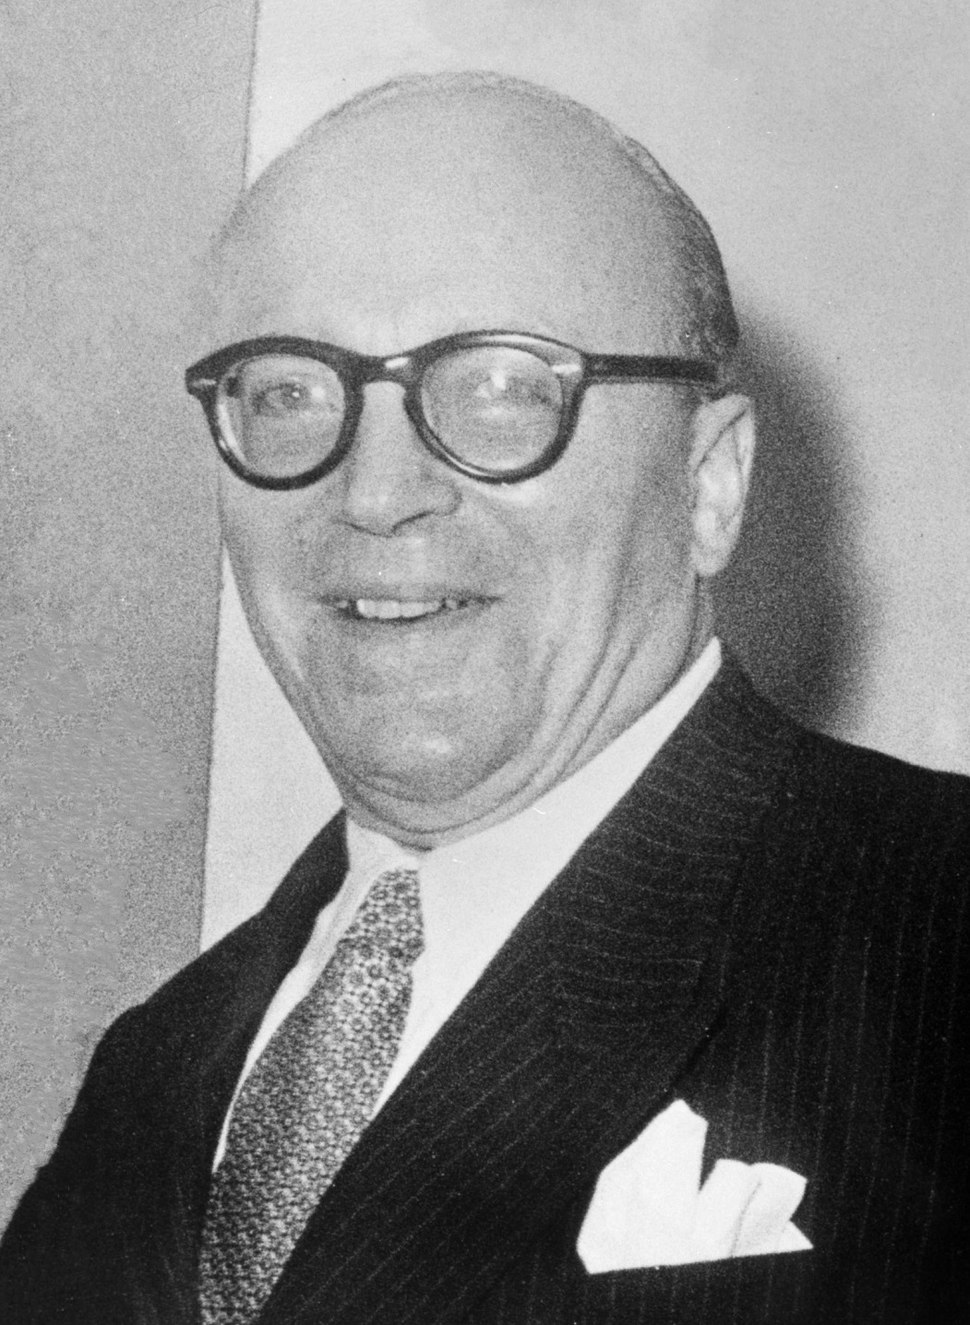 Stefanos Stefanopoulos 1965